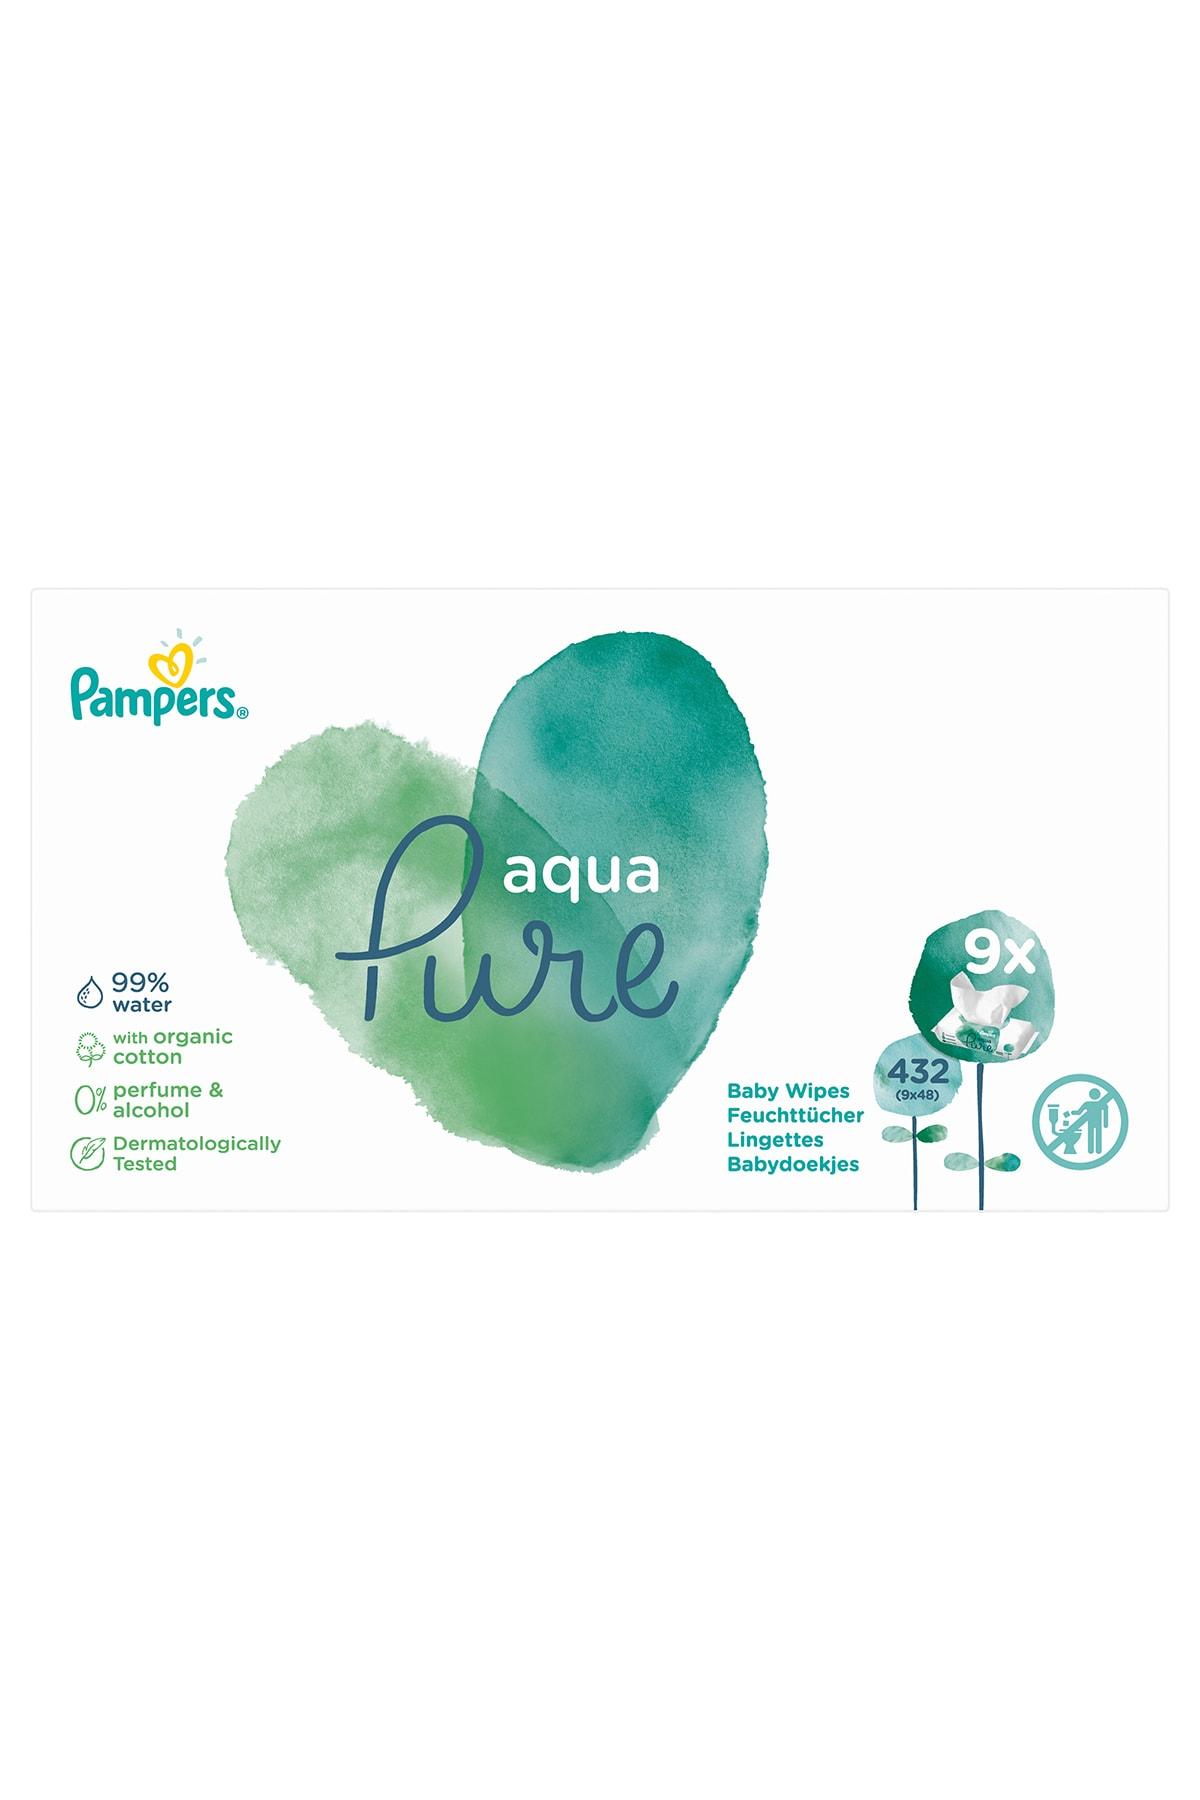 Prima Islak Havluaqua Pure 9'lu Fırsat Paketi 432 Yaprak 2